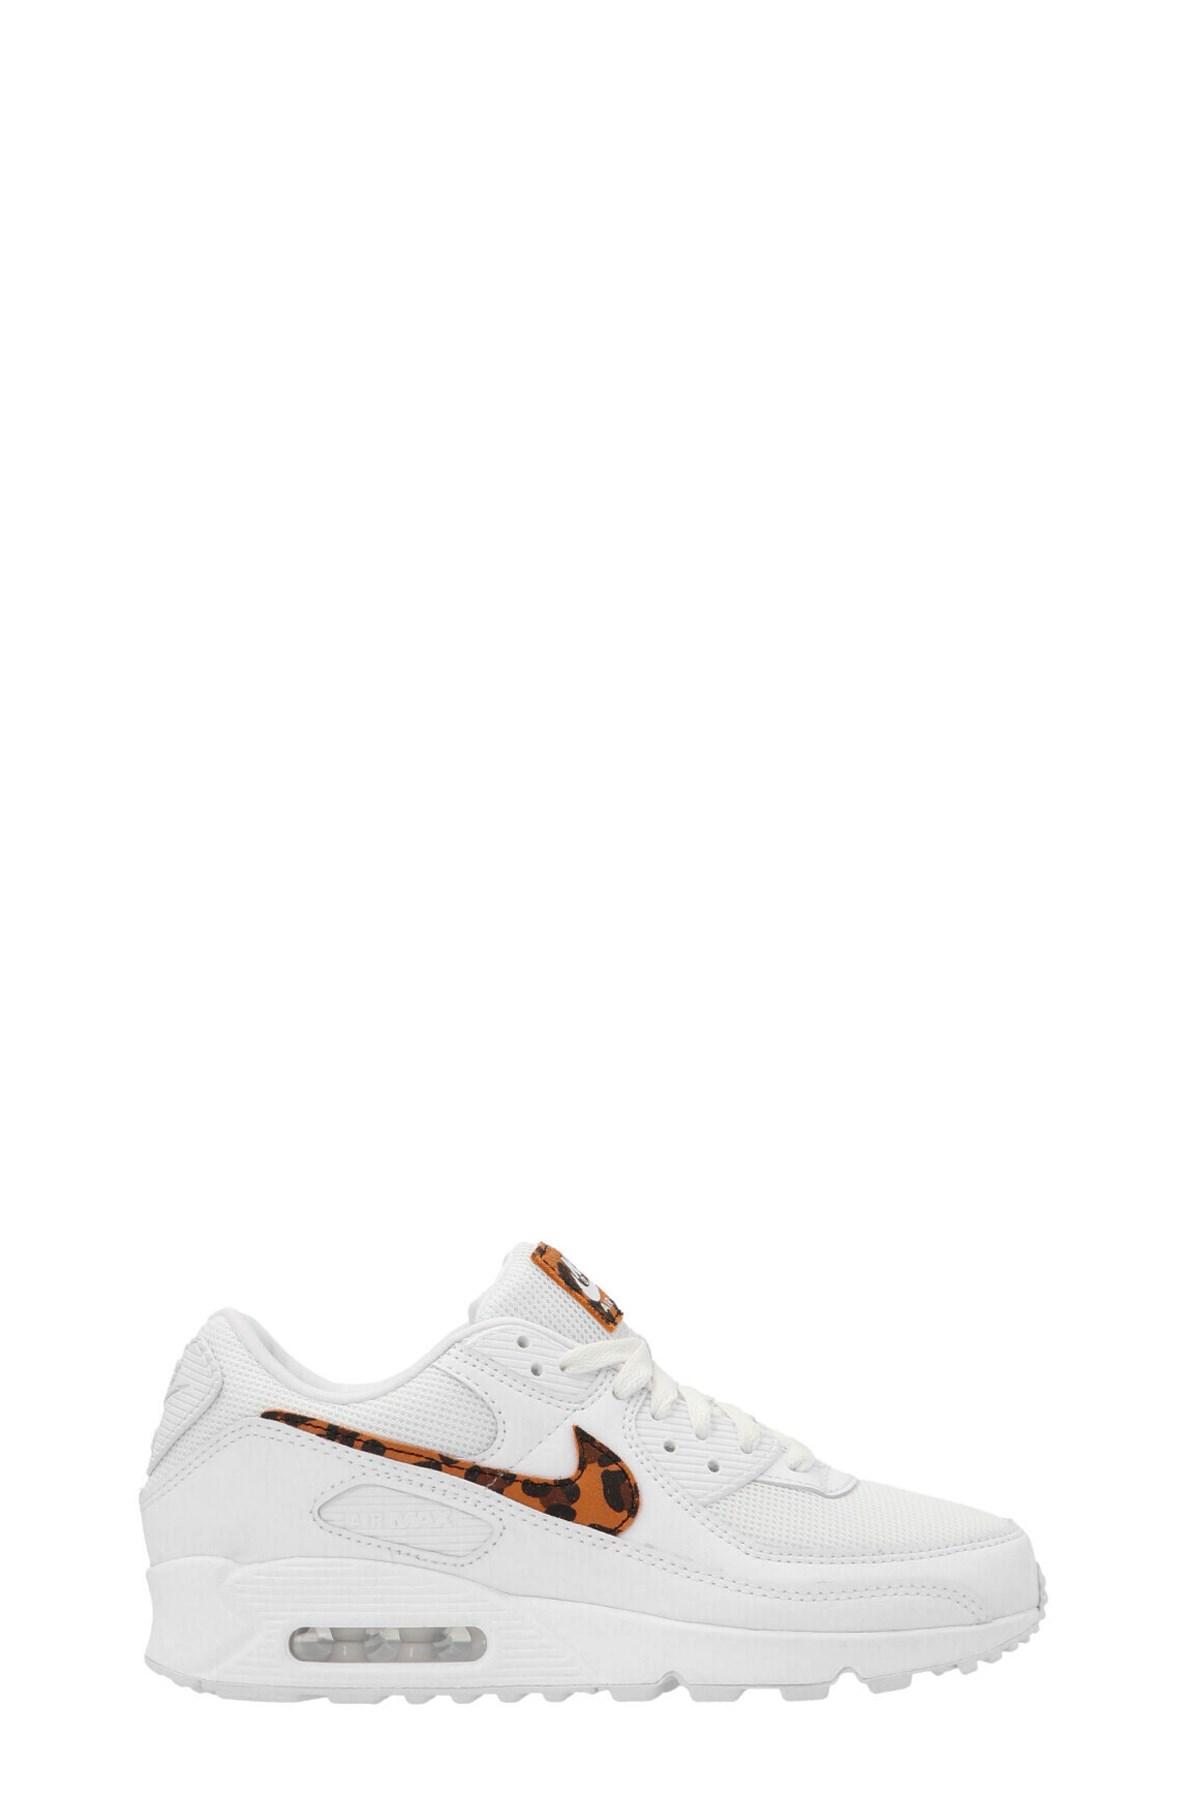 'Air Max 90 ax' sneakers